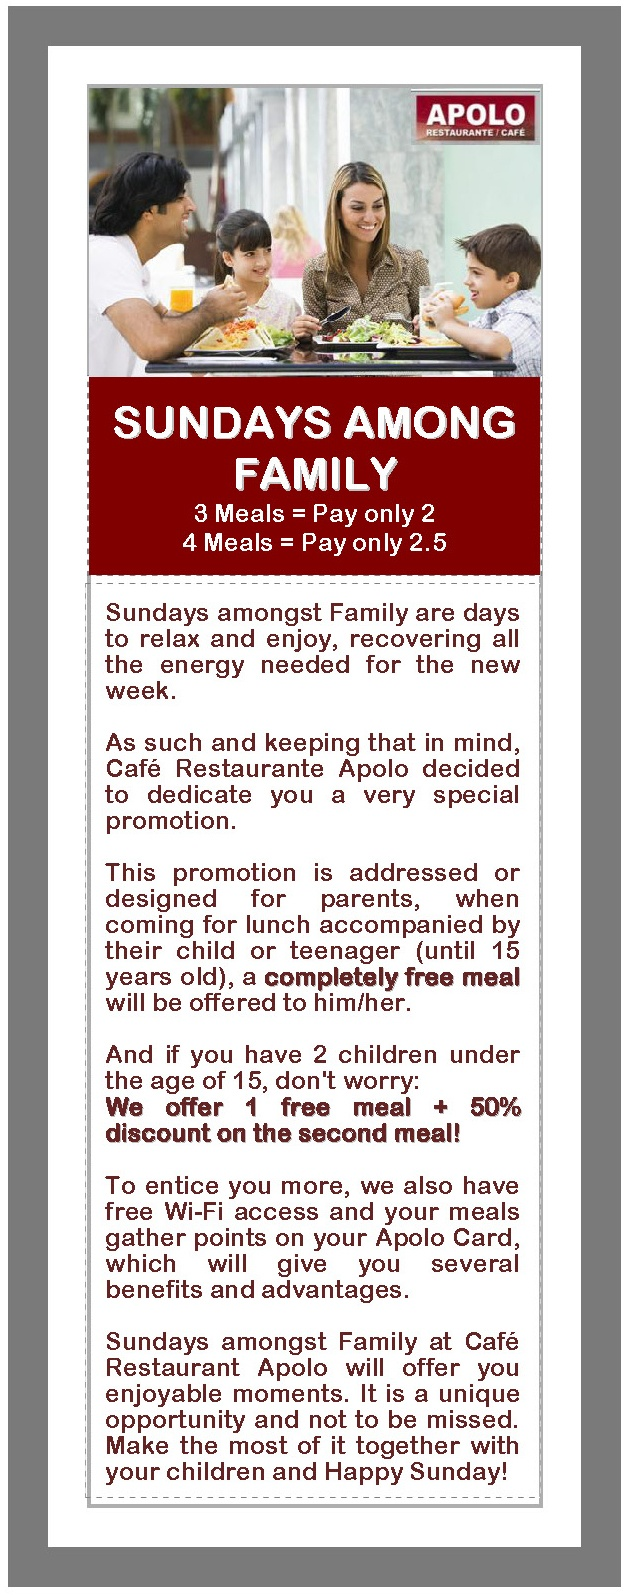 Sundays among family at Apolo